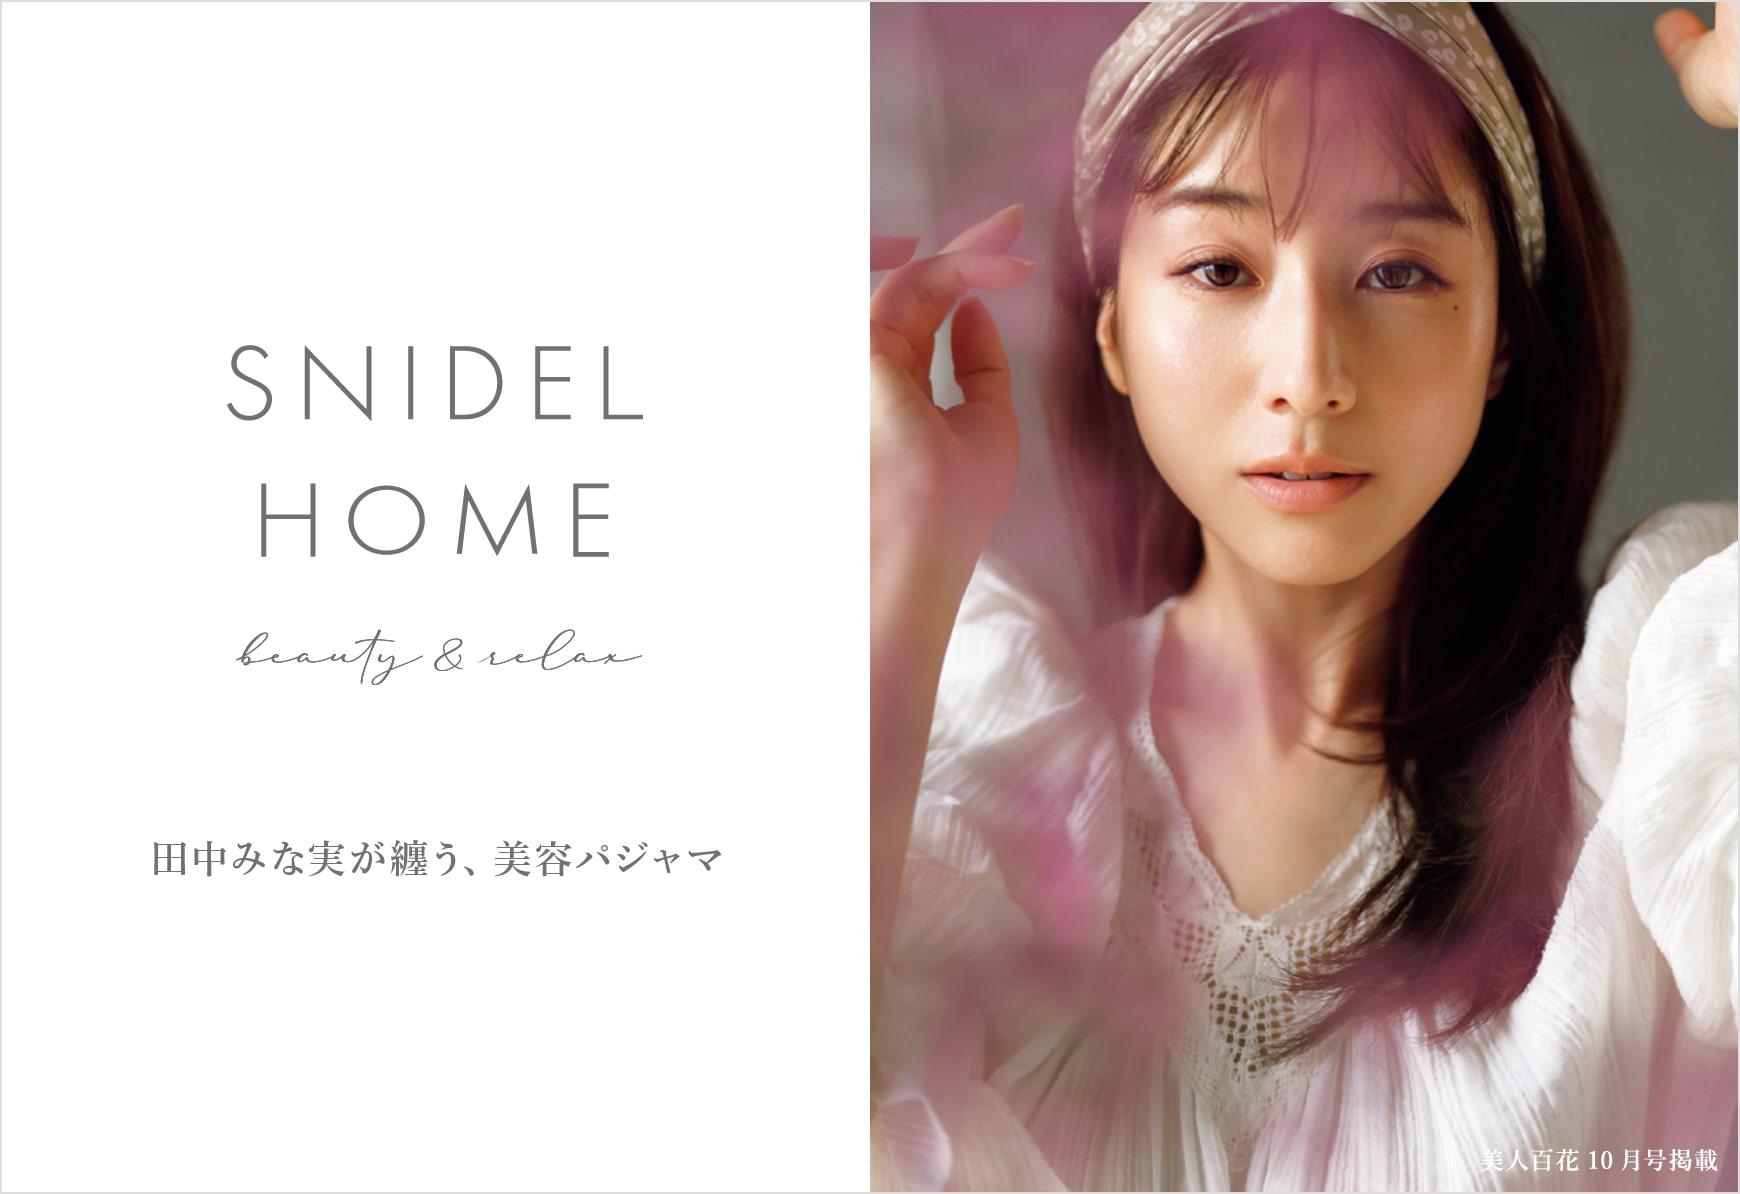 SNIDEL HOME Beauty & Relax 田中みな実が纏う、美容パジャマ